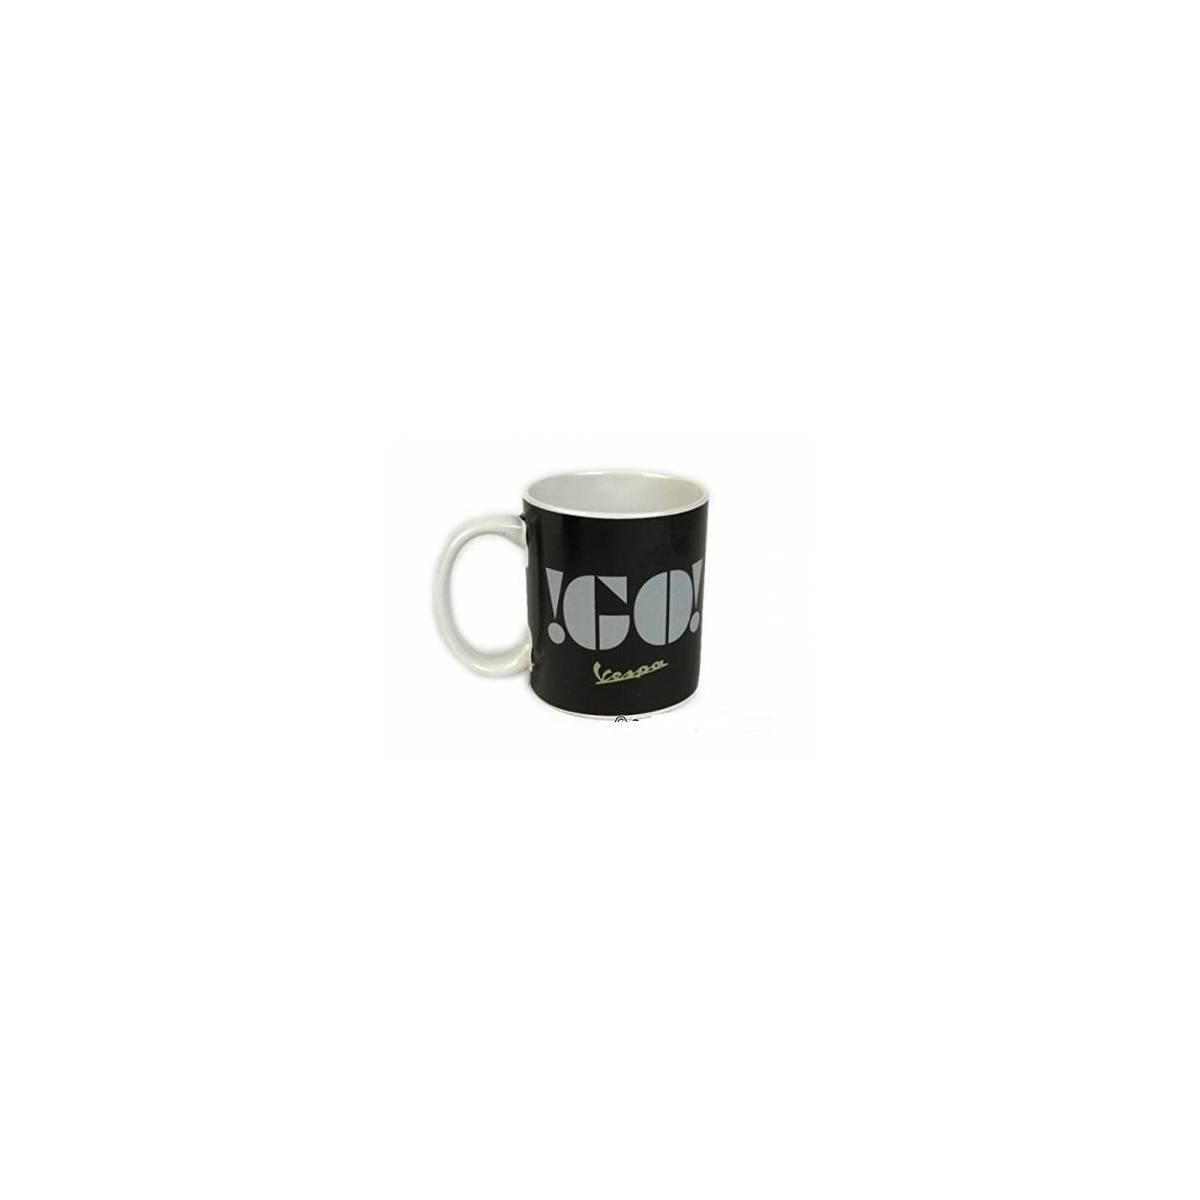 Vespa - Mug en Céramique Go Vespa - Noir